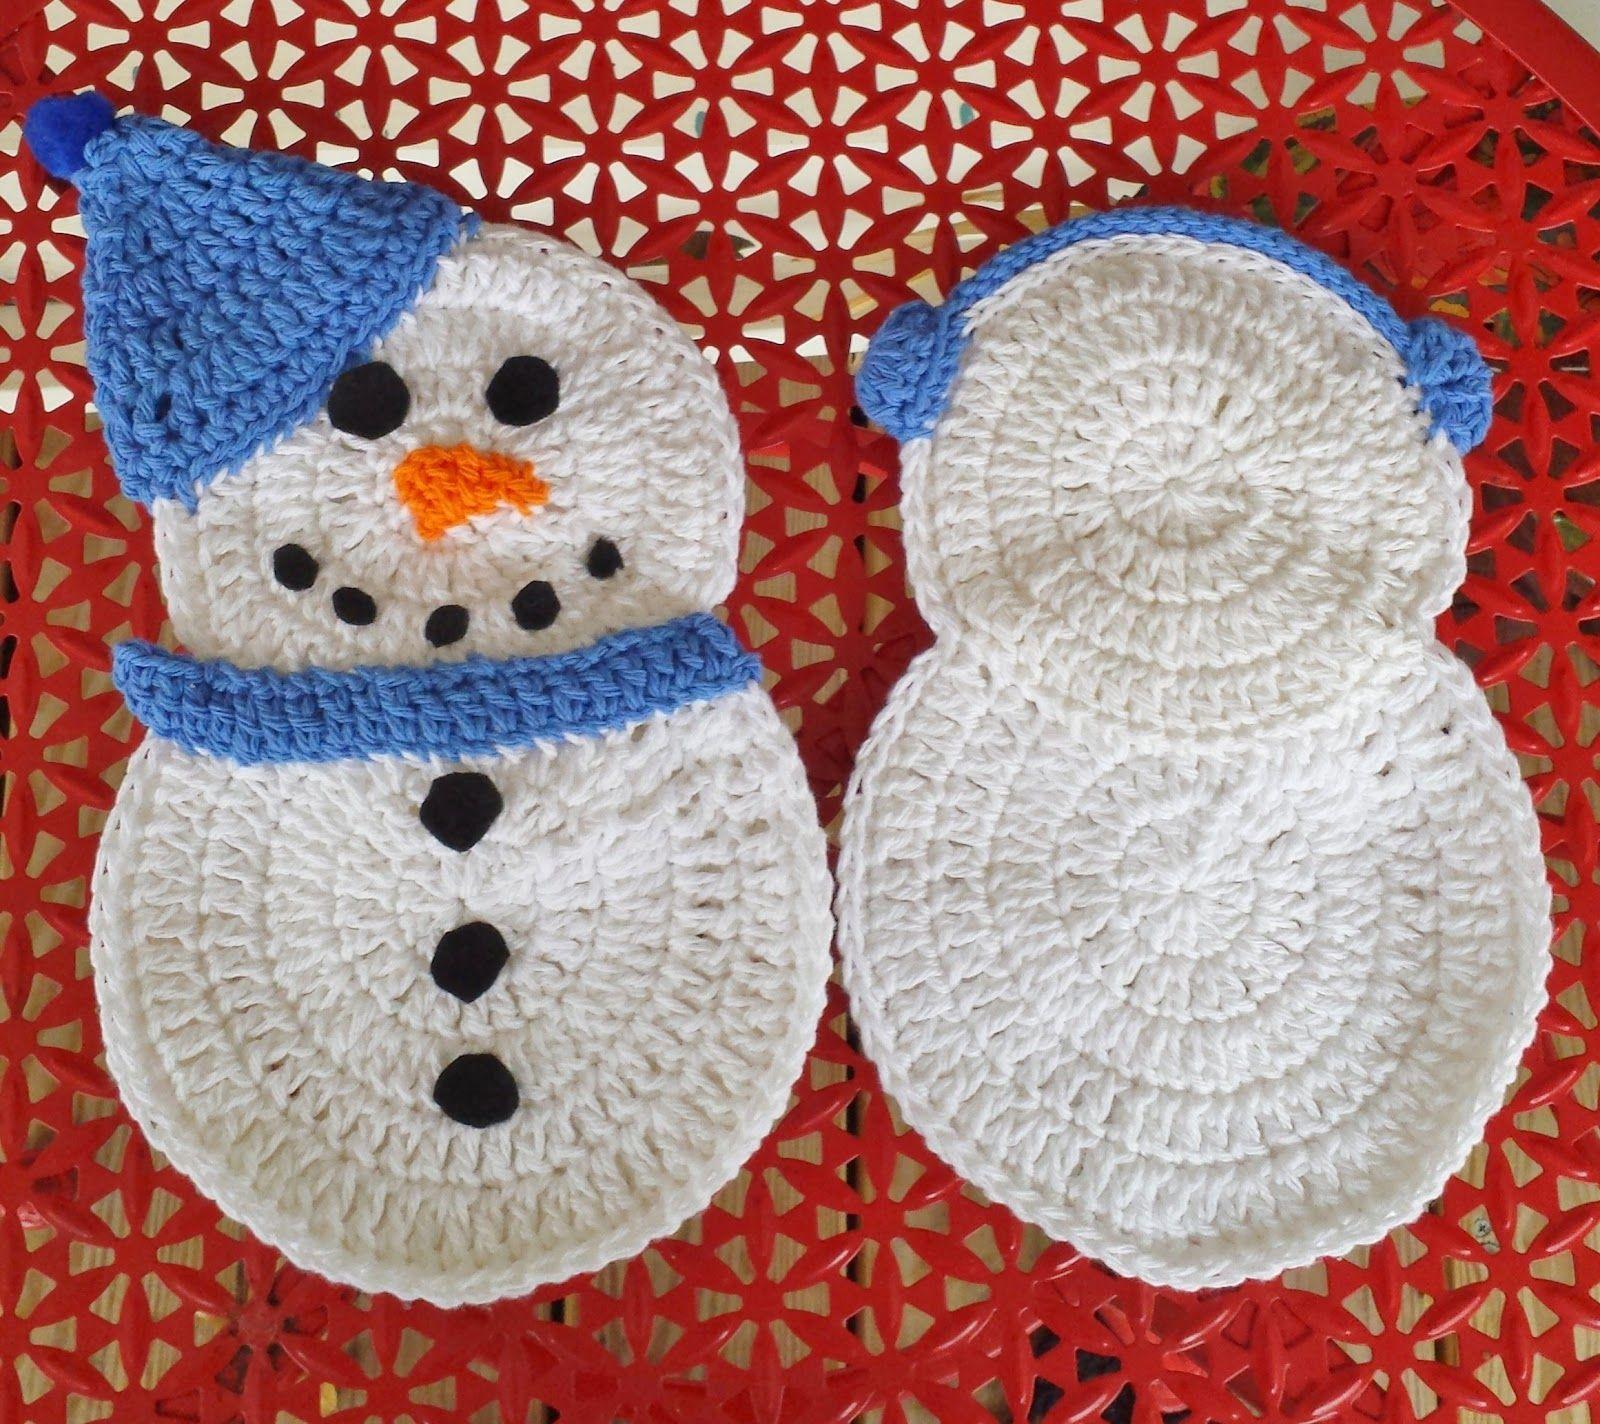 Pin von Teresa Scragg auf Crochet Potholders | Pinterest | Handarbeiten